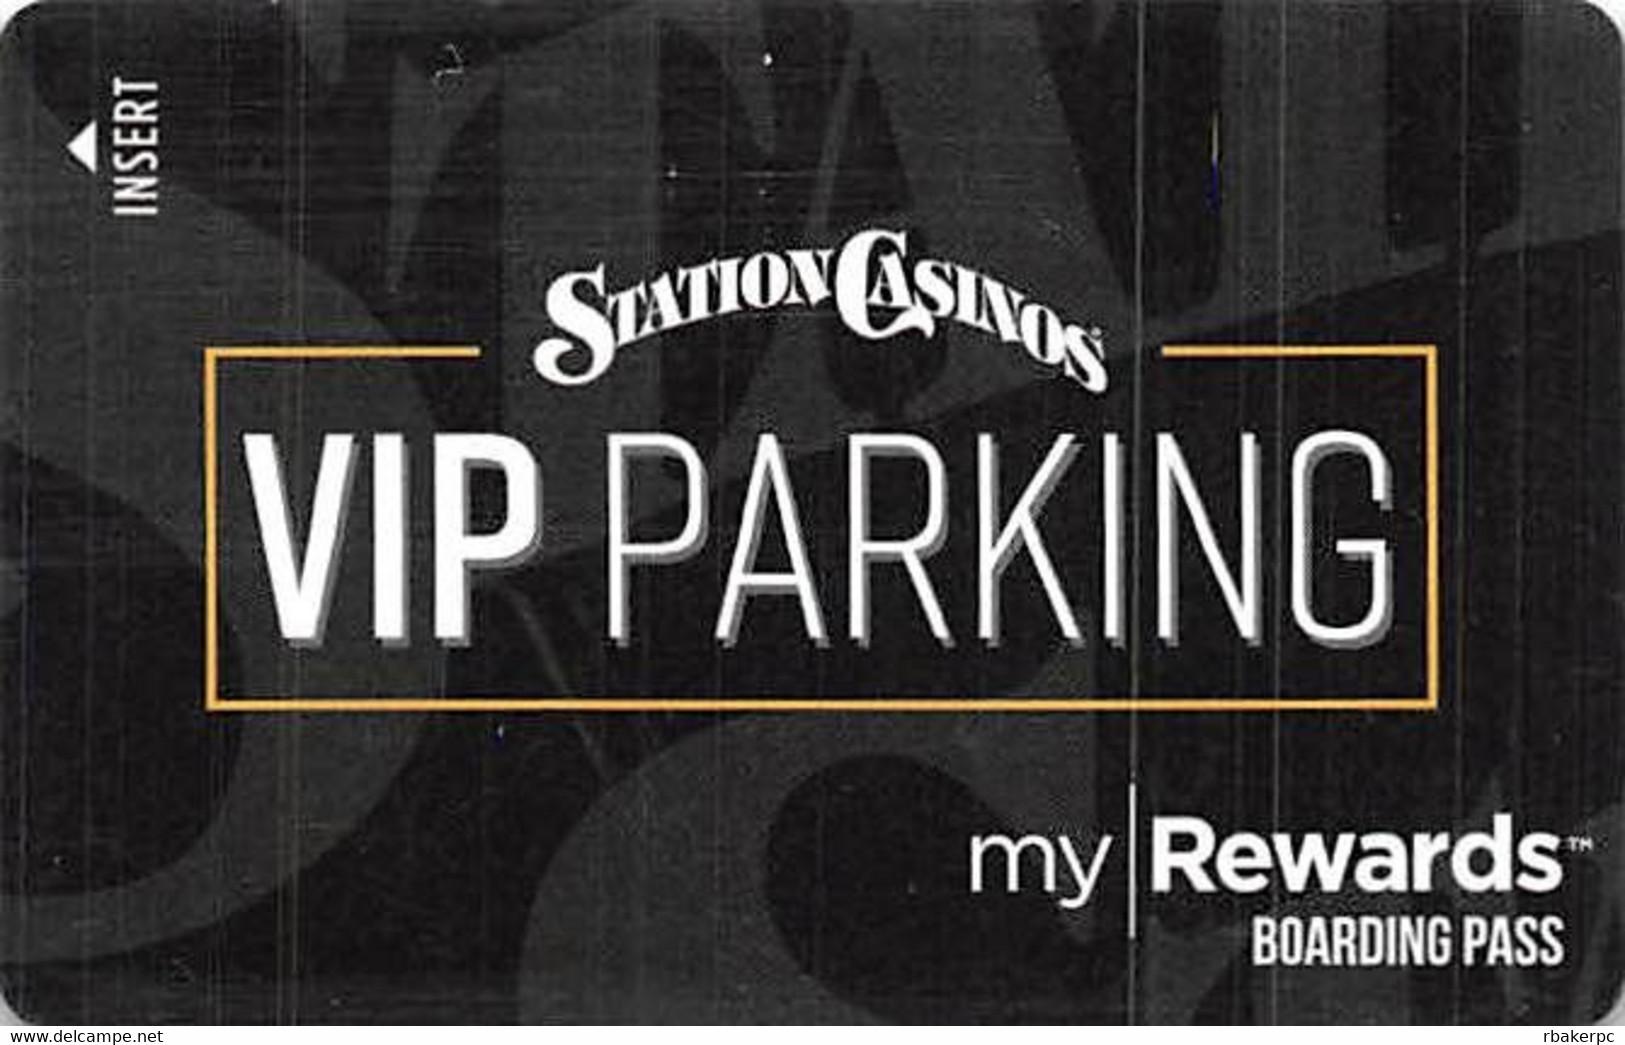 Station Casinos Las Vegas, NV - VIP Parking Card - Copyright 2018 - Exp  6/30/18 - Casino Cards